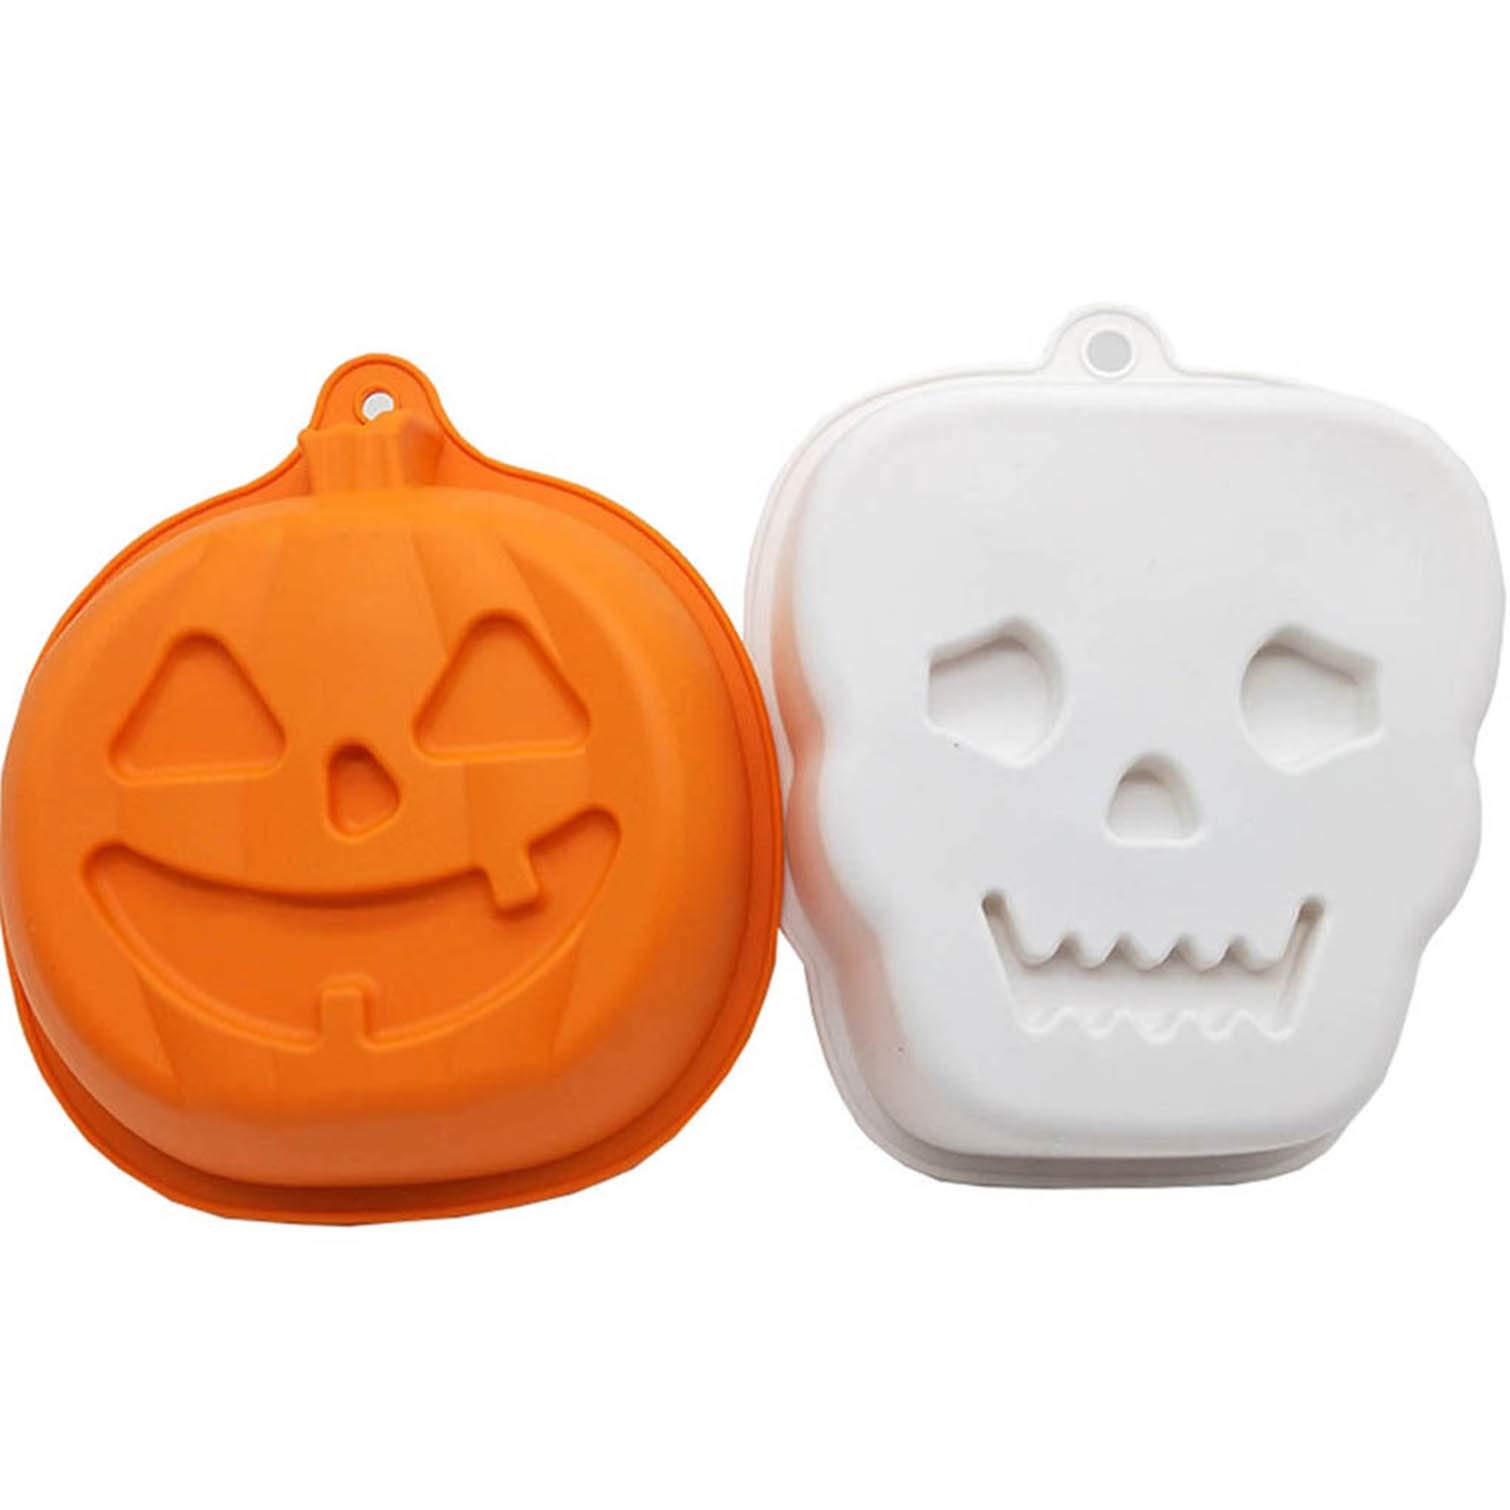 Silicone Baking Pans Molds Cake - Bundt Cake Skull Halloween Pumpkin Cakelet Pan Nonstick,Ice Molds Silicone